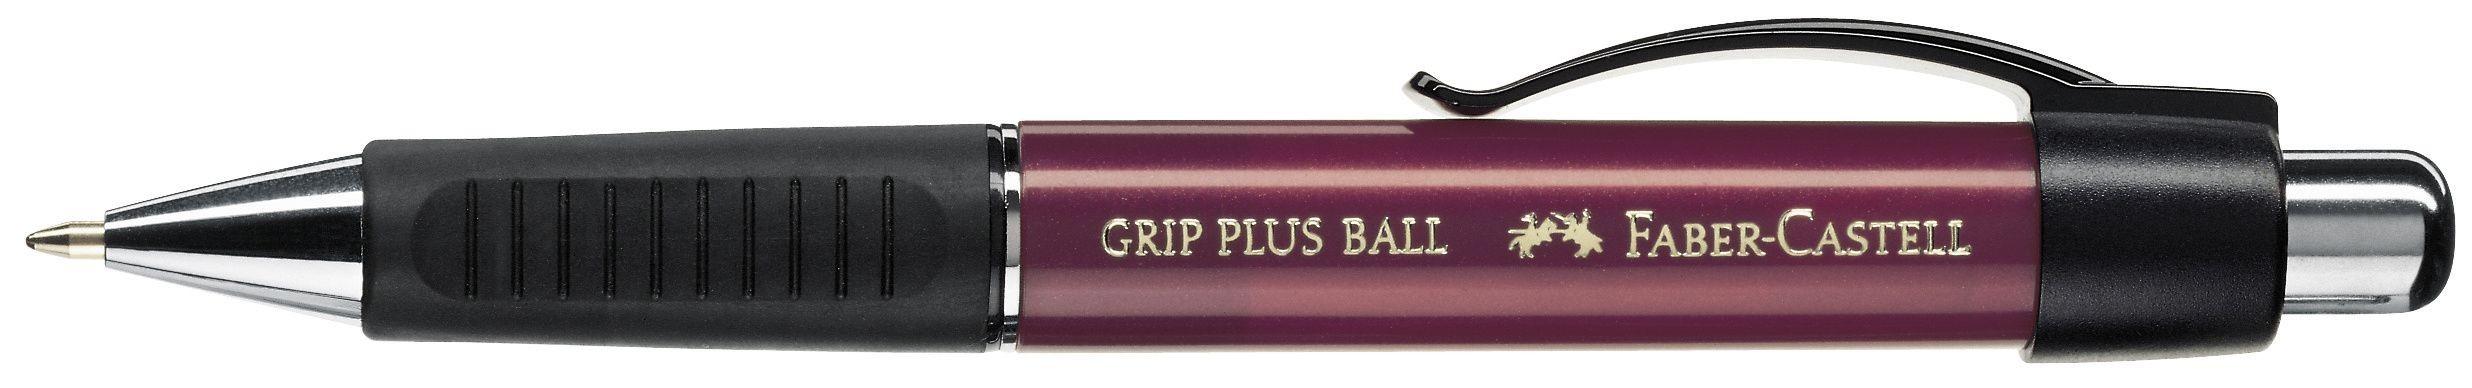 PIX GRIP PLUS 1407 ROSU FABER-CASTELL